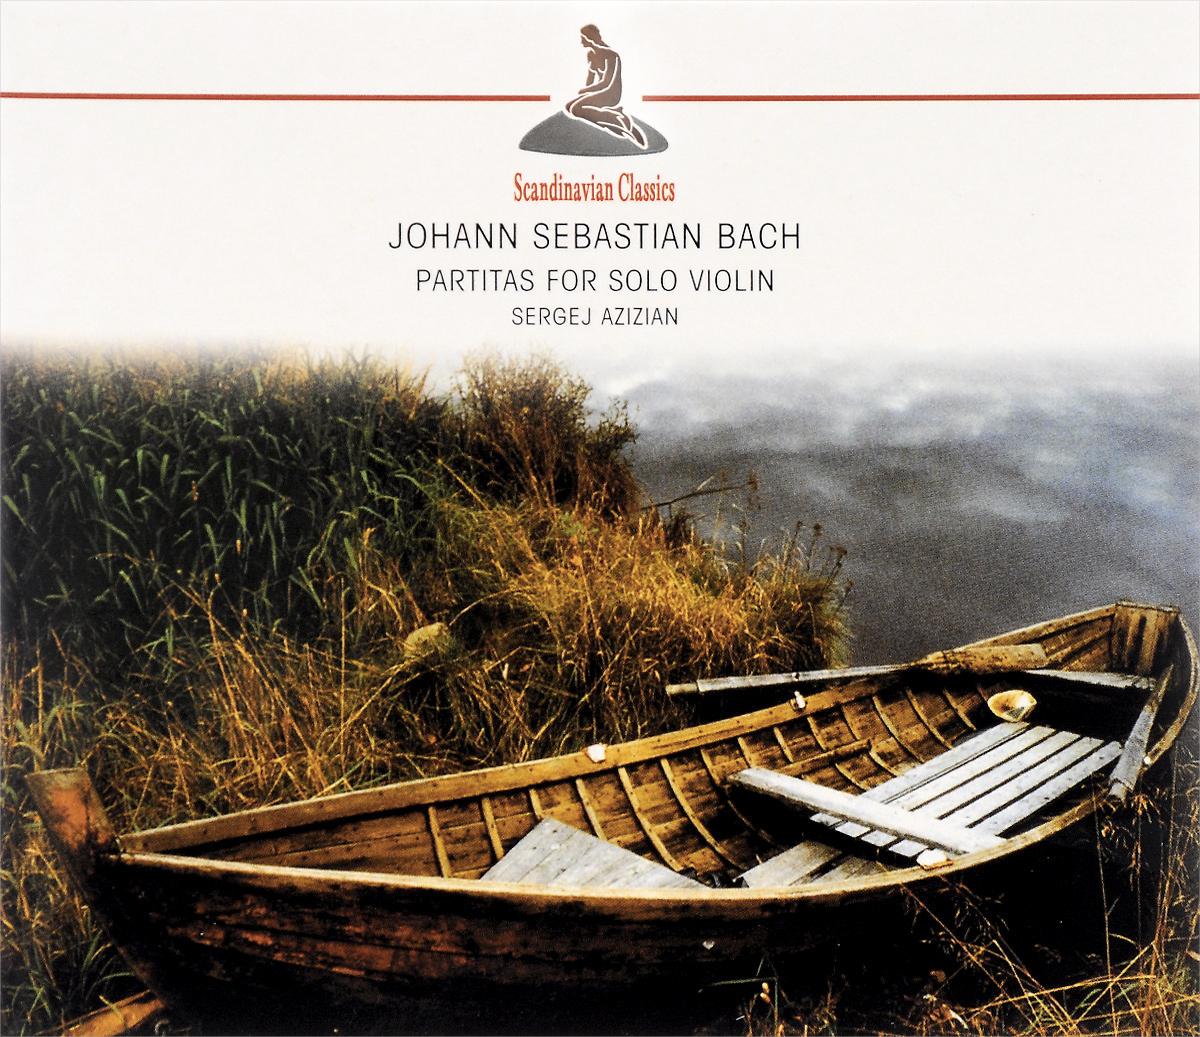 Johann Sebastian Bach. Partitas For Solo Violin tim murphey music and song